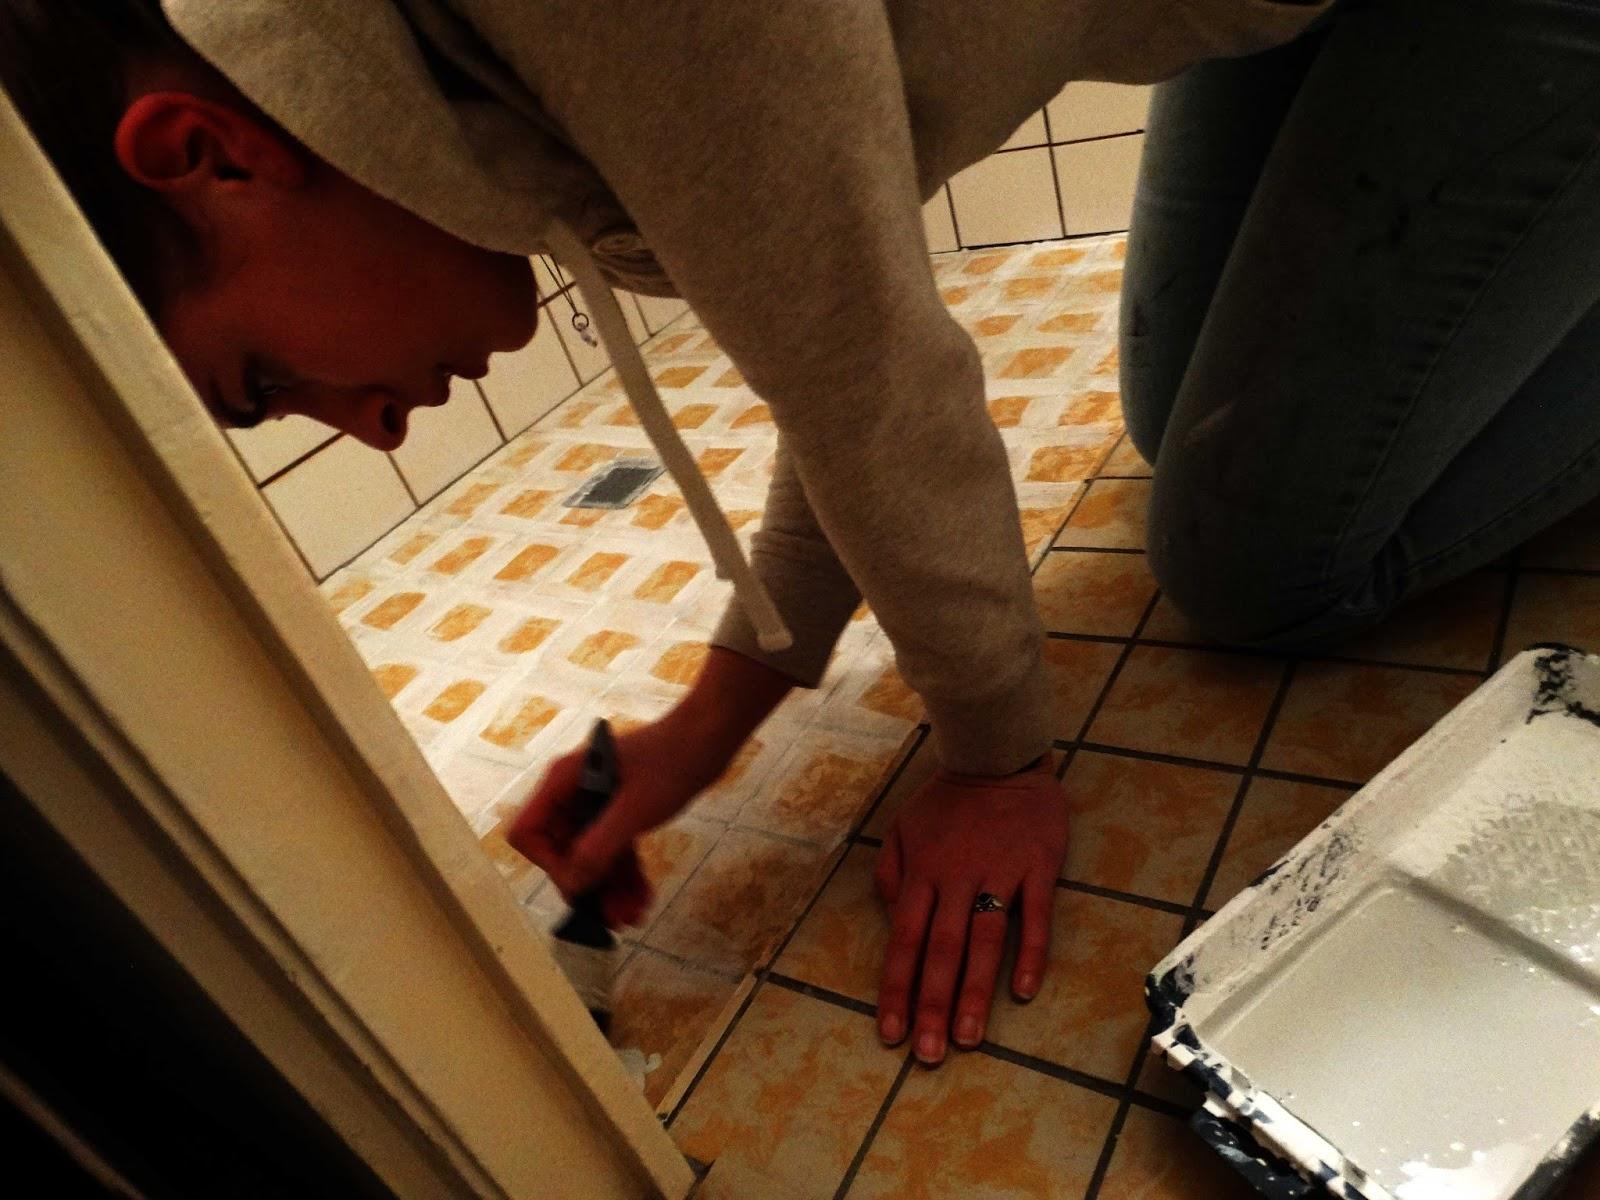 Gele Vloertegels Badkamer : Badkamer make over vloertegels verven judit s klusboek